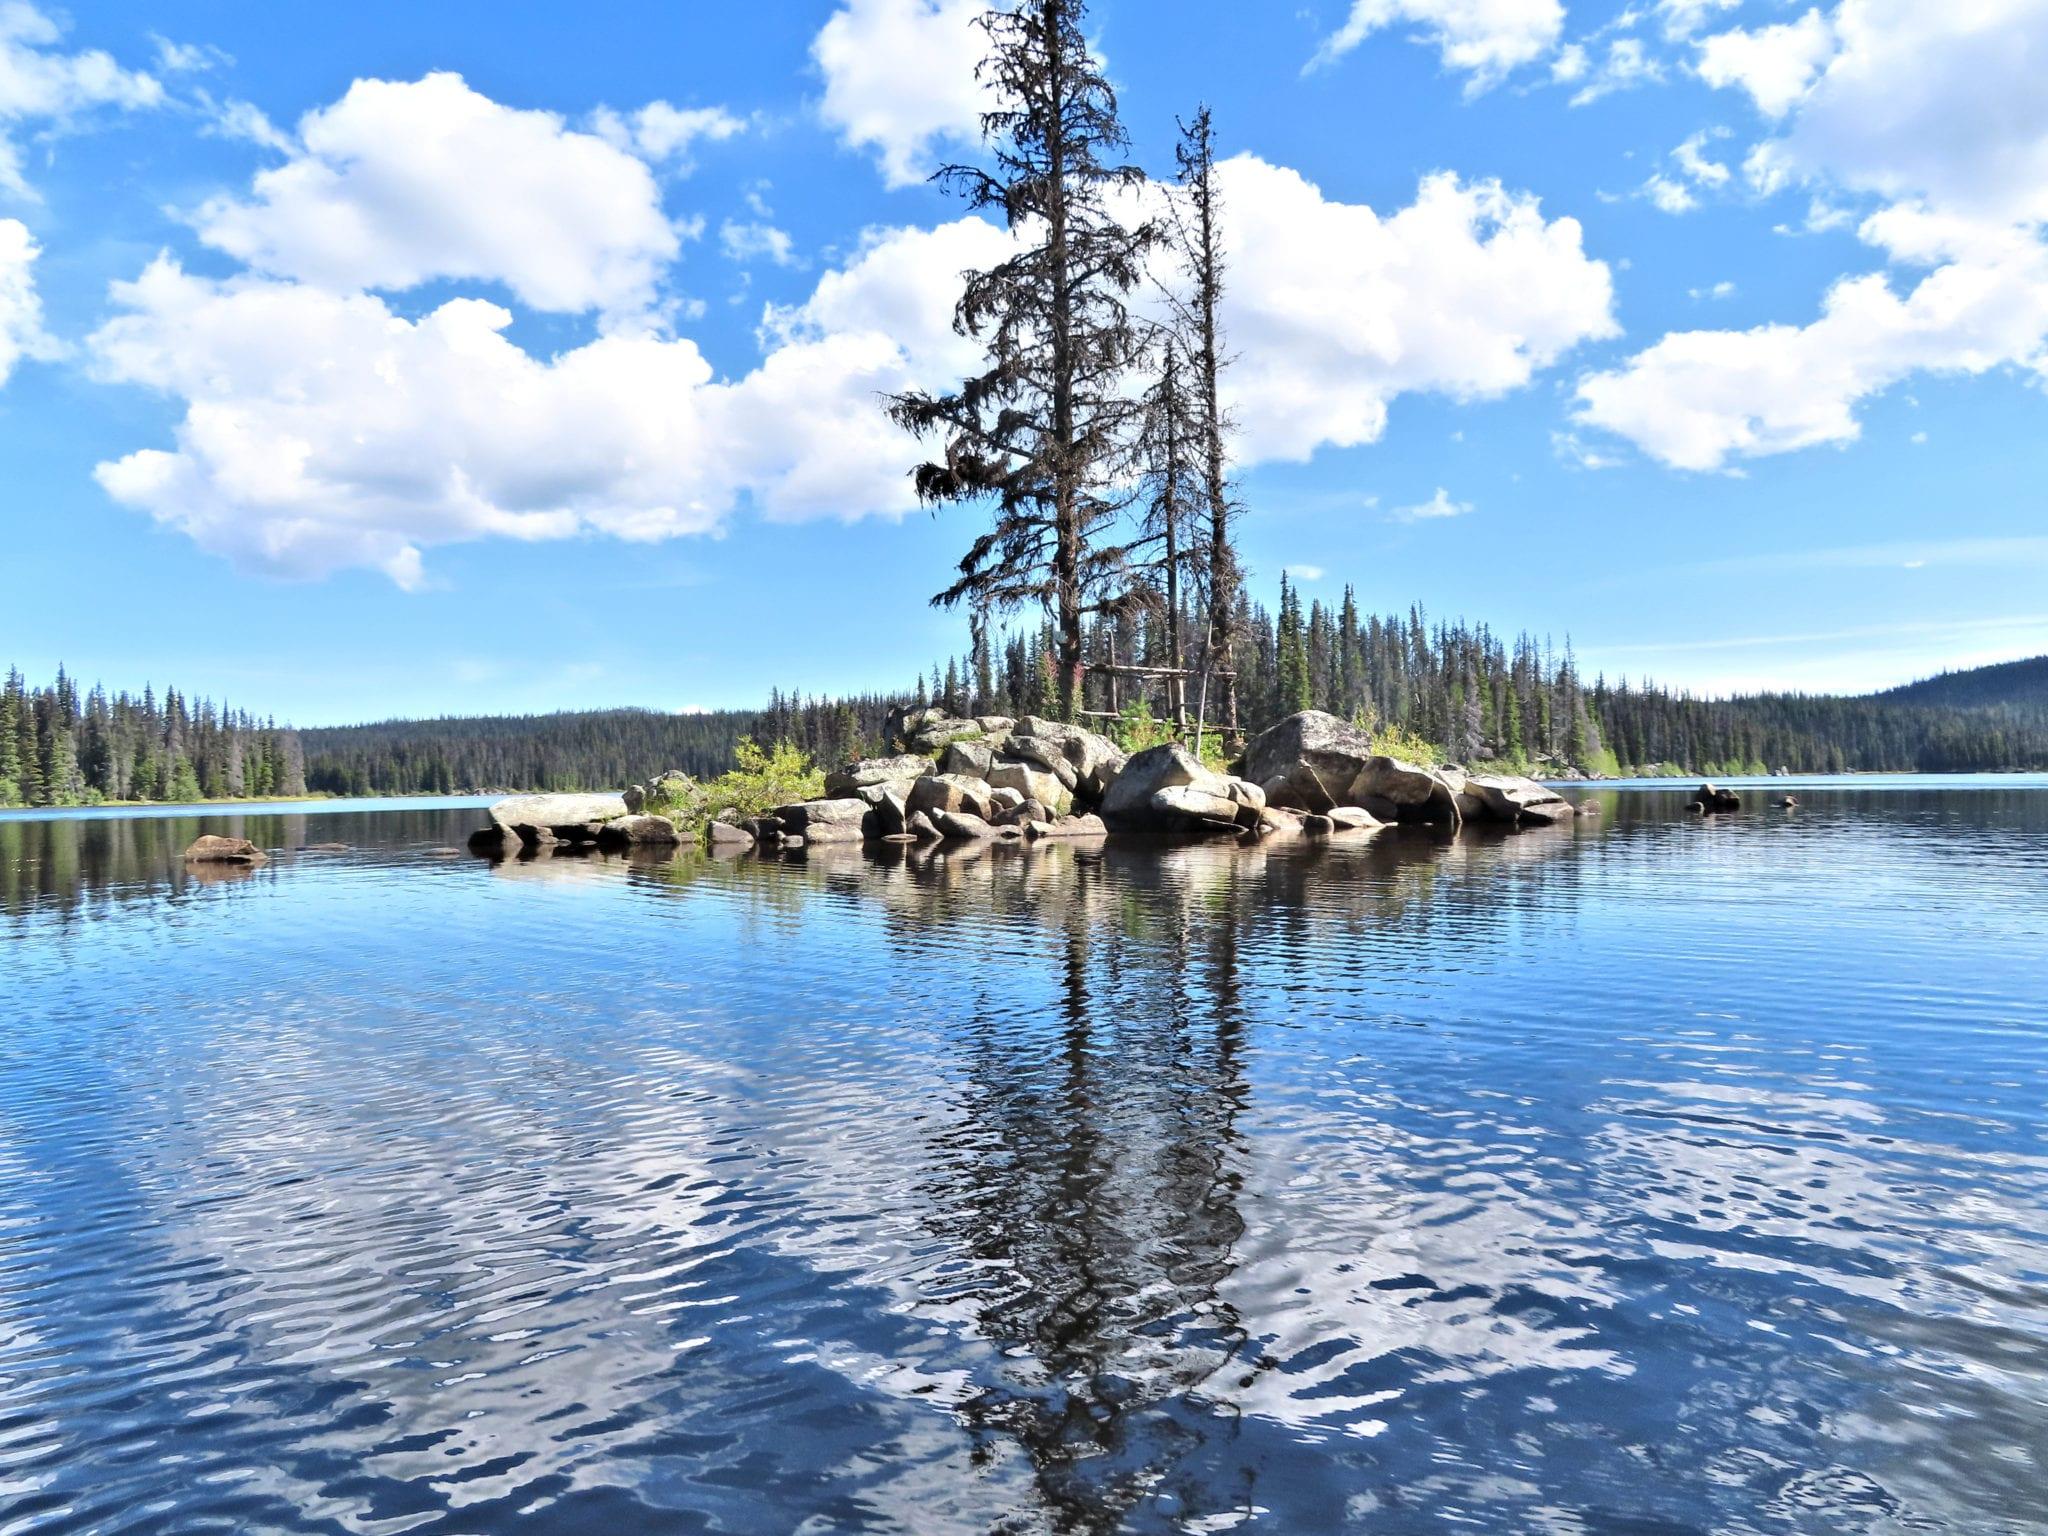 To Tsintsunko Lake - Kamloops Trails